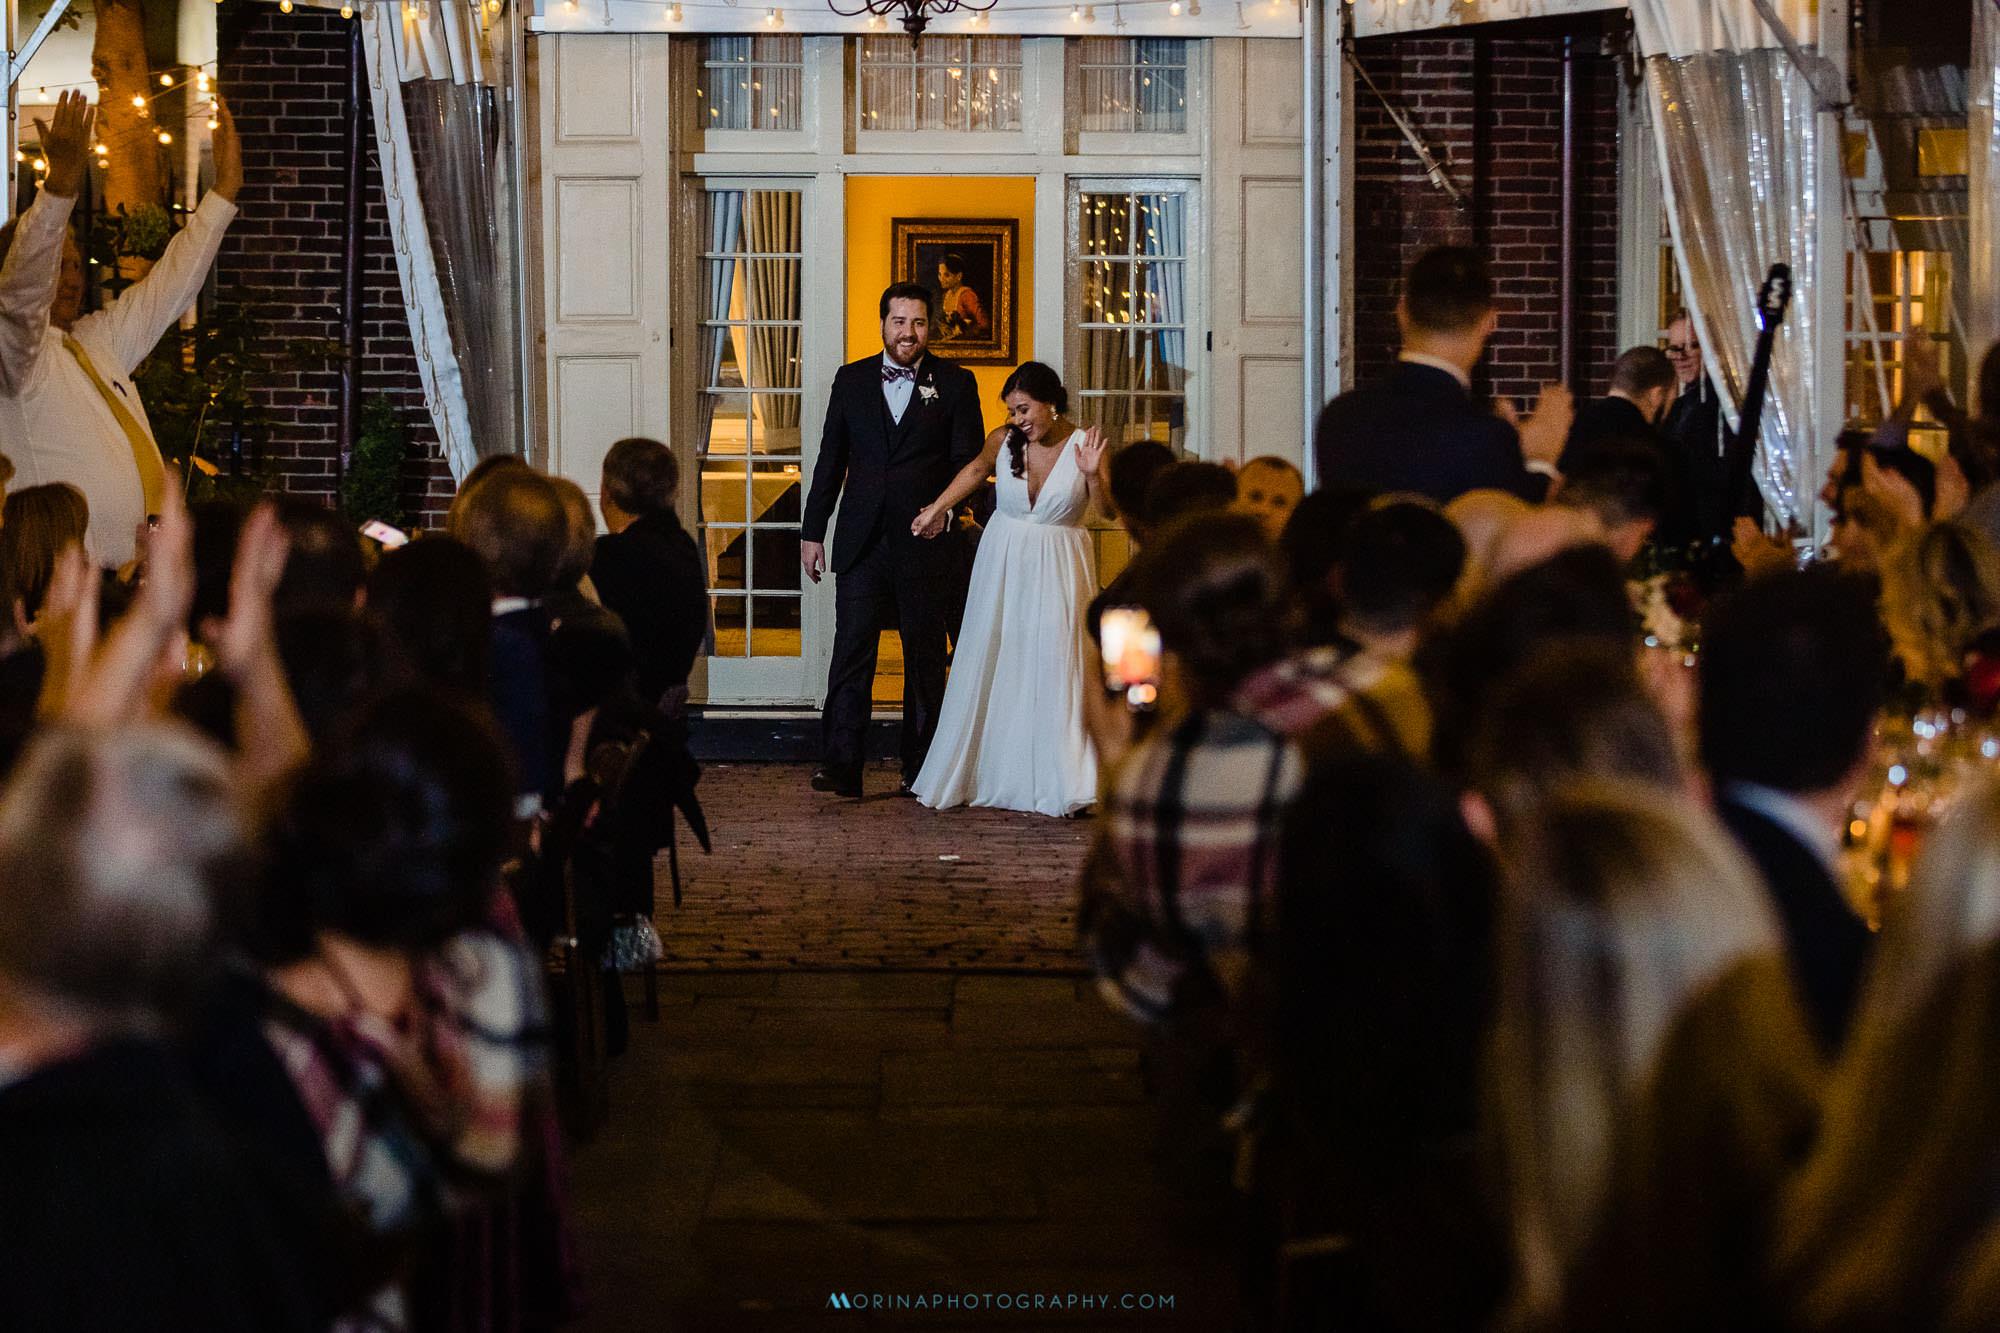 Yuki & Michael Wedding at Morris House Hotel Blog 0076.jpg